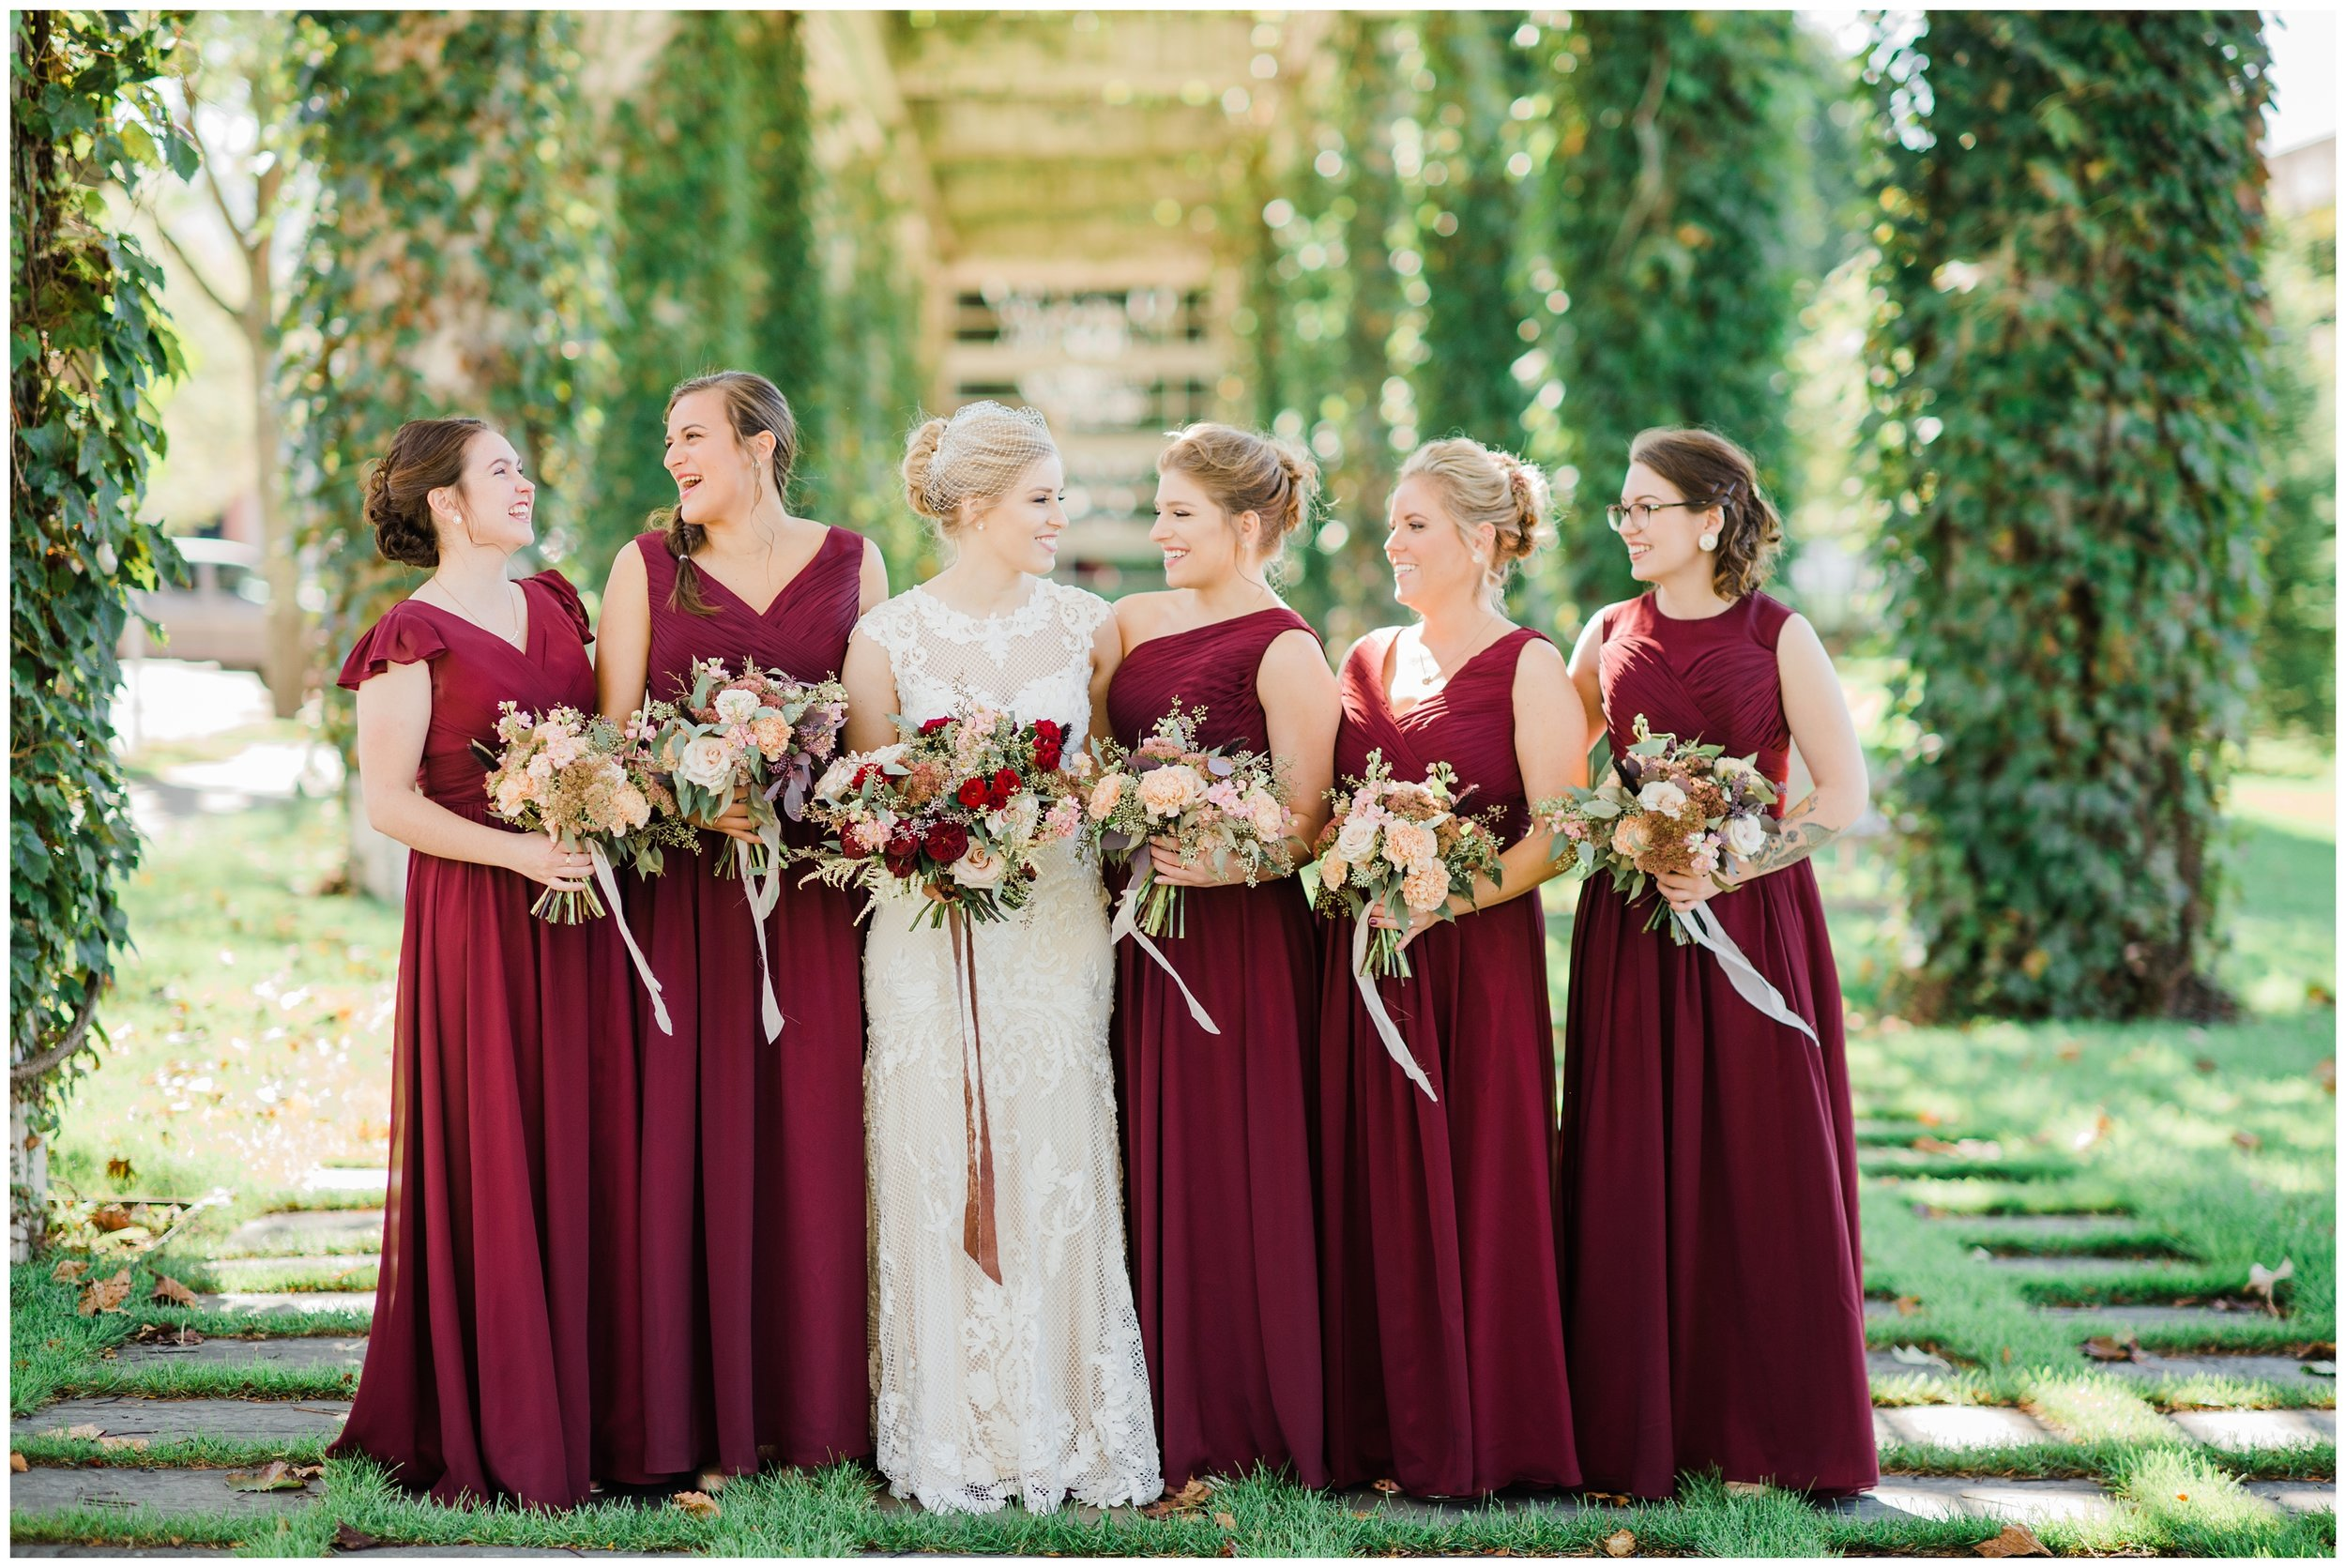 Rebecca_Shehorn_Photography_Indianapolis_Wedding_Photographer_7325.jpg